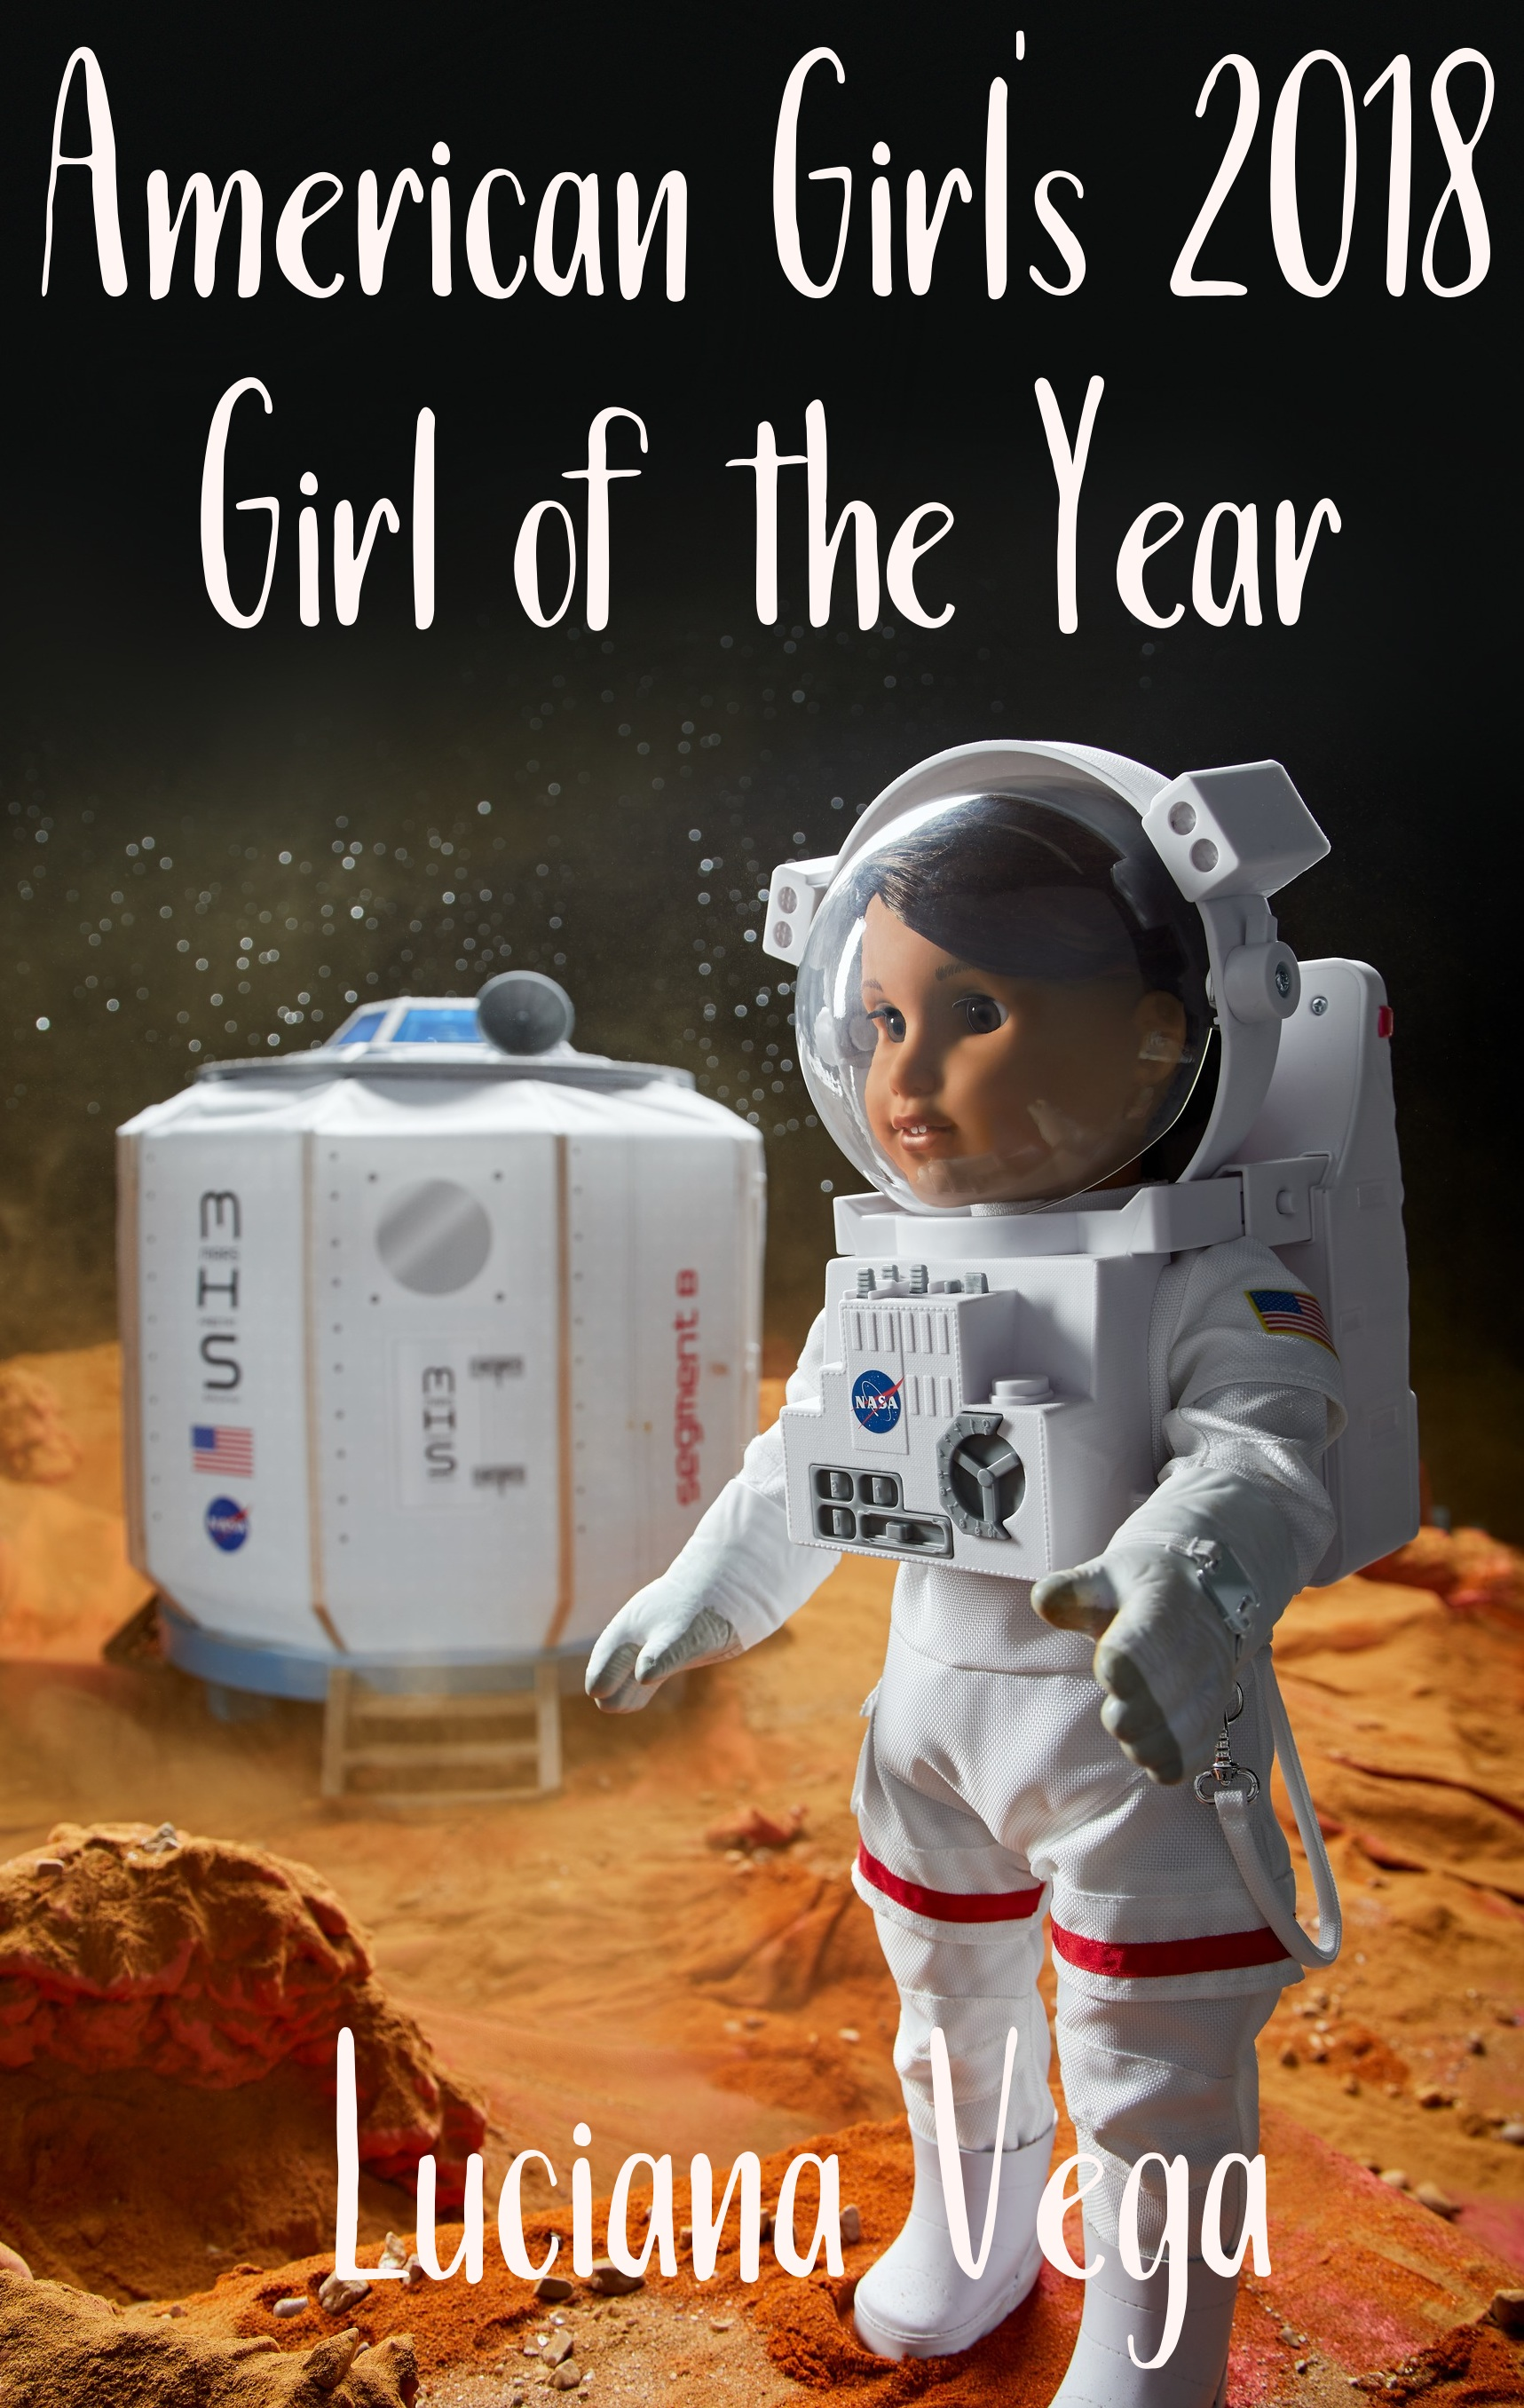 American+Girl%27s+2018+Girl+of+the+Year+Is+Luciana+Vega+-+Aspiring+Astronaut